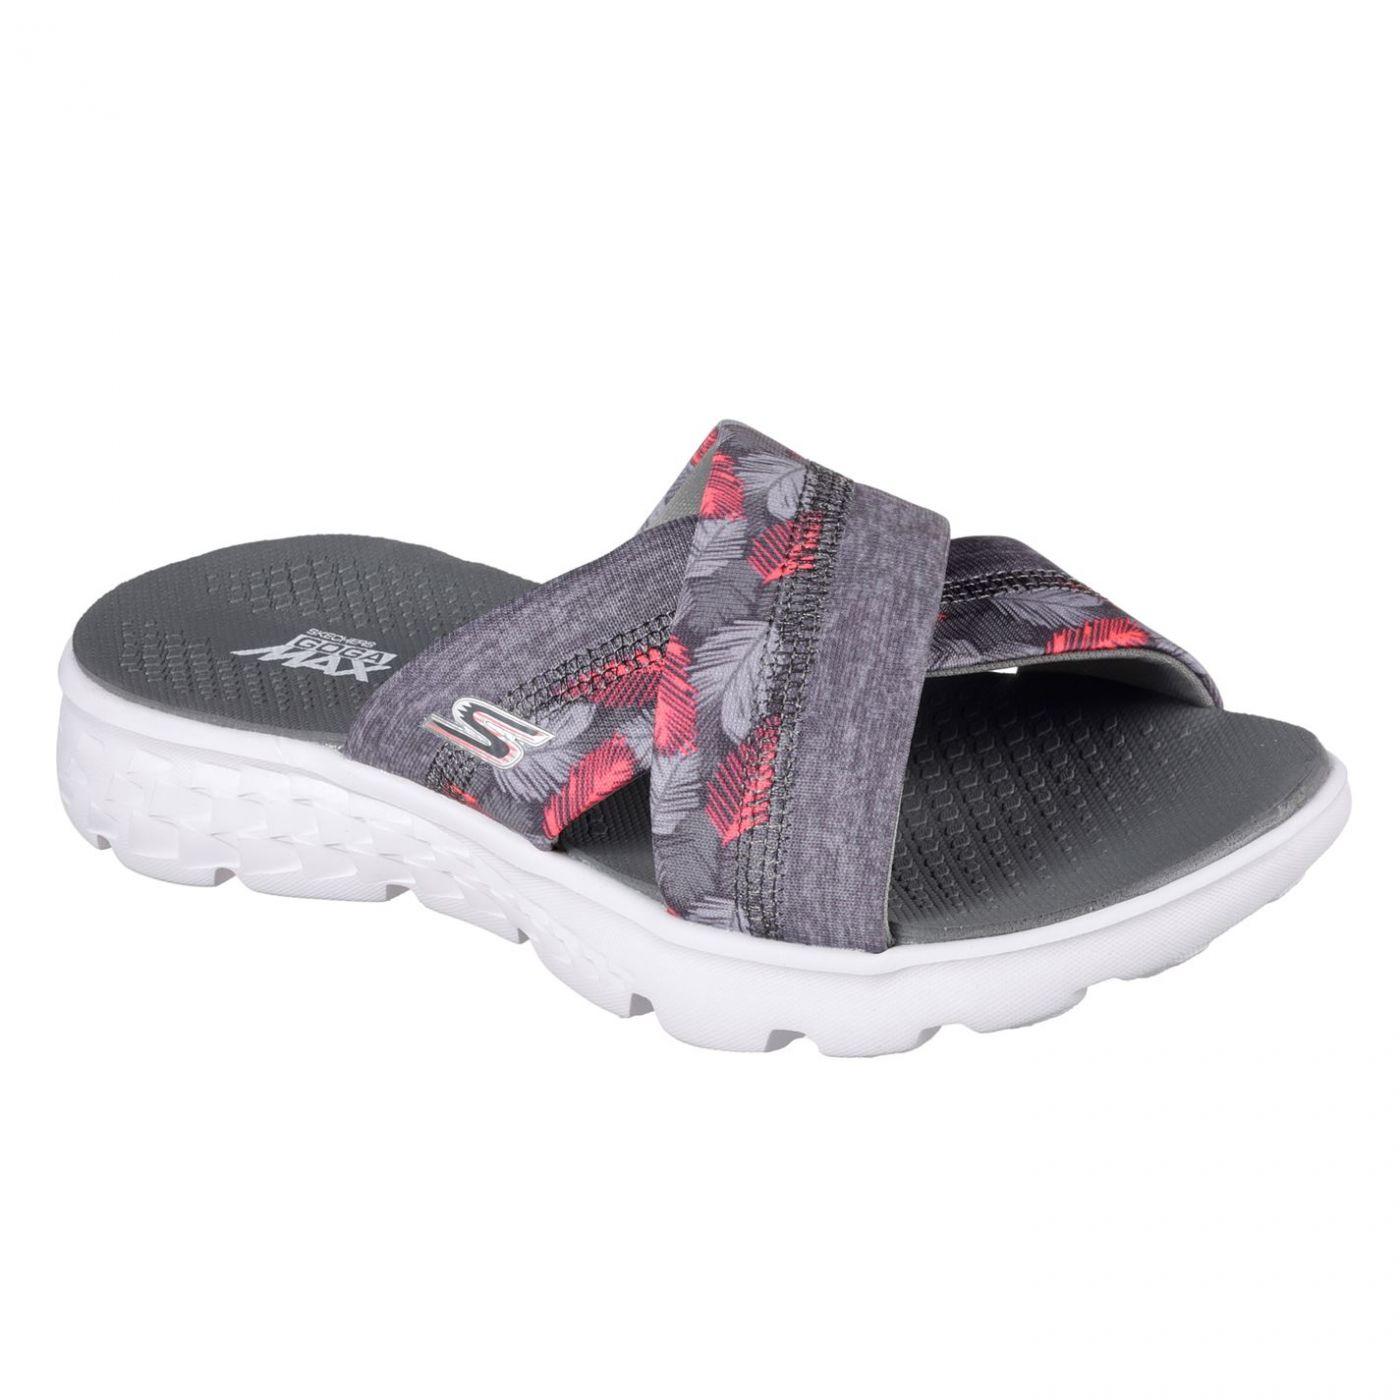 Skechers On The Go Tropical Flip Flops Ladies